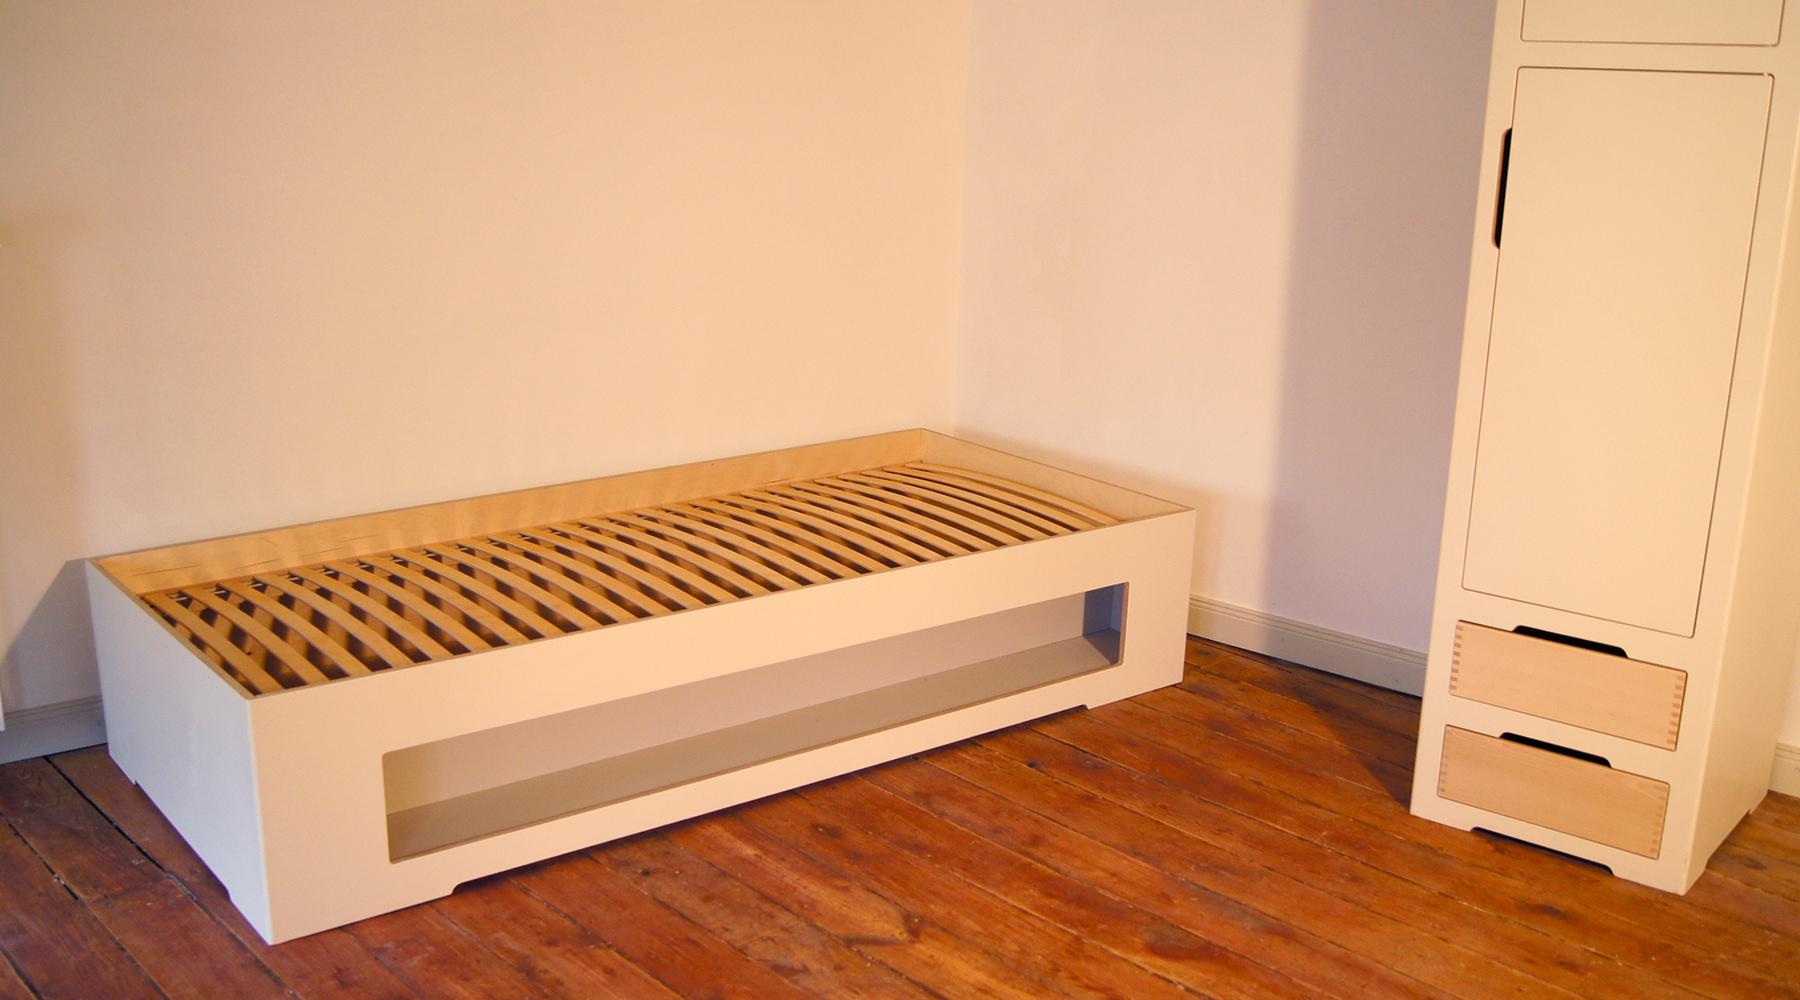 studenten haus dynamische kollektion. Black Bedroom Furniture Sets. Home Design Ideas